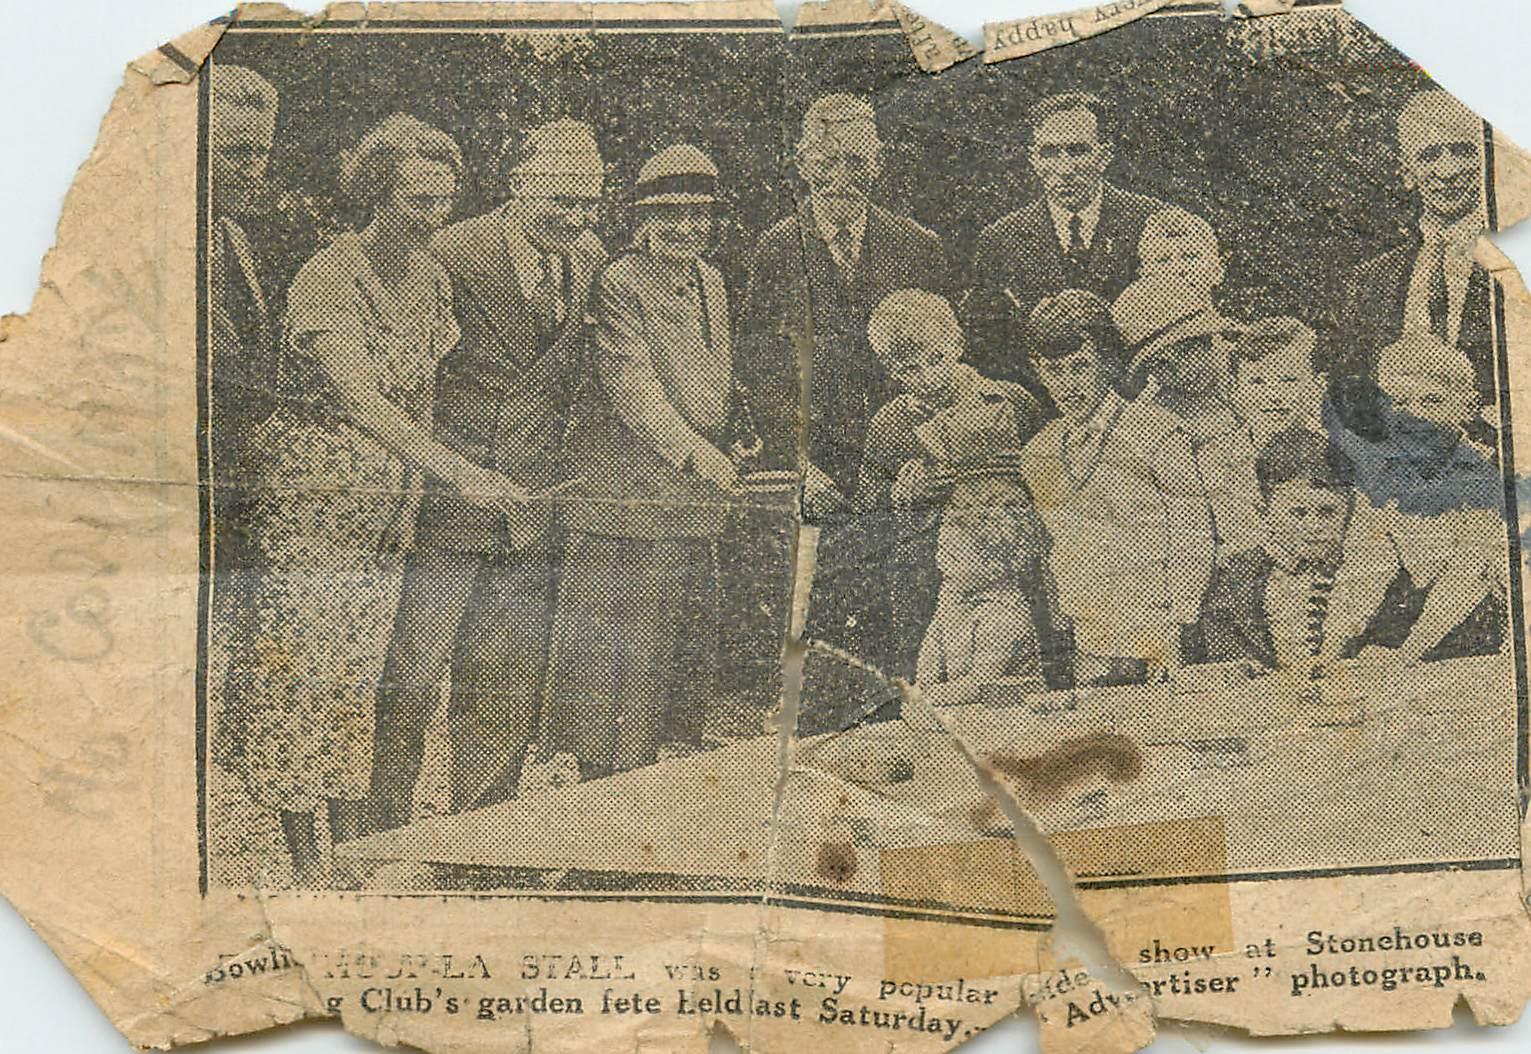 Garden Fete newspaper clipping